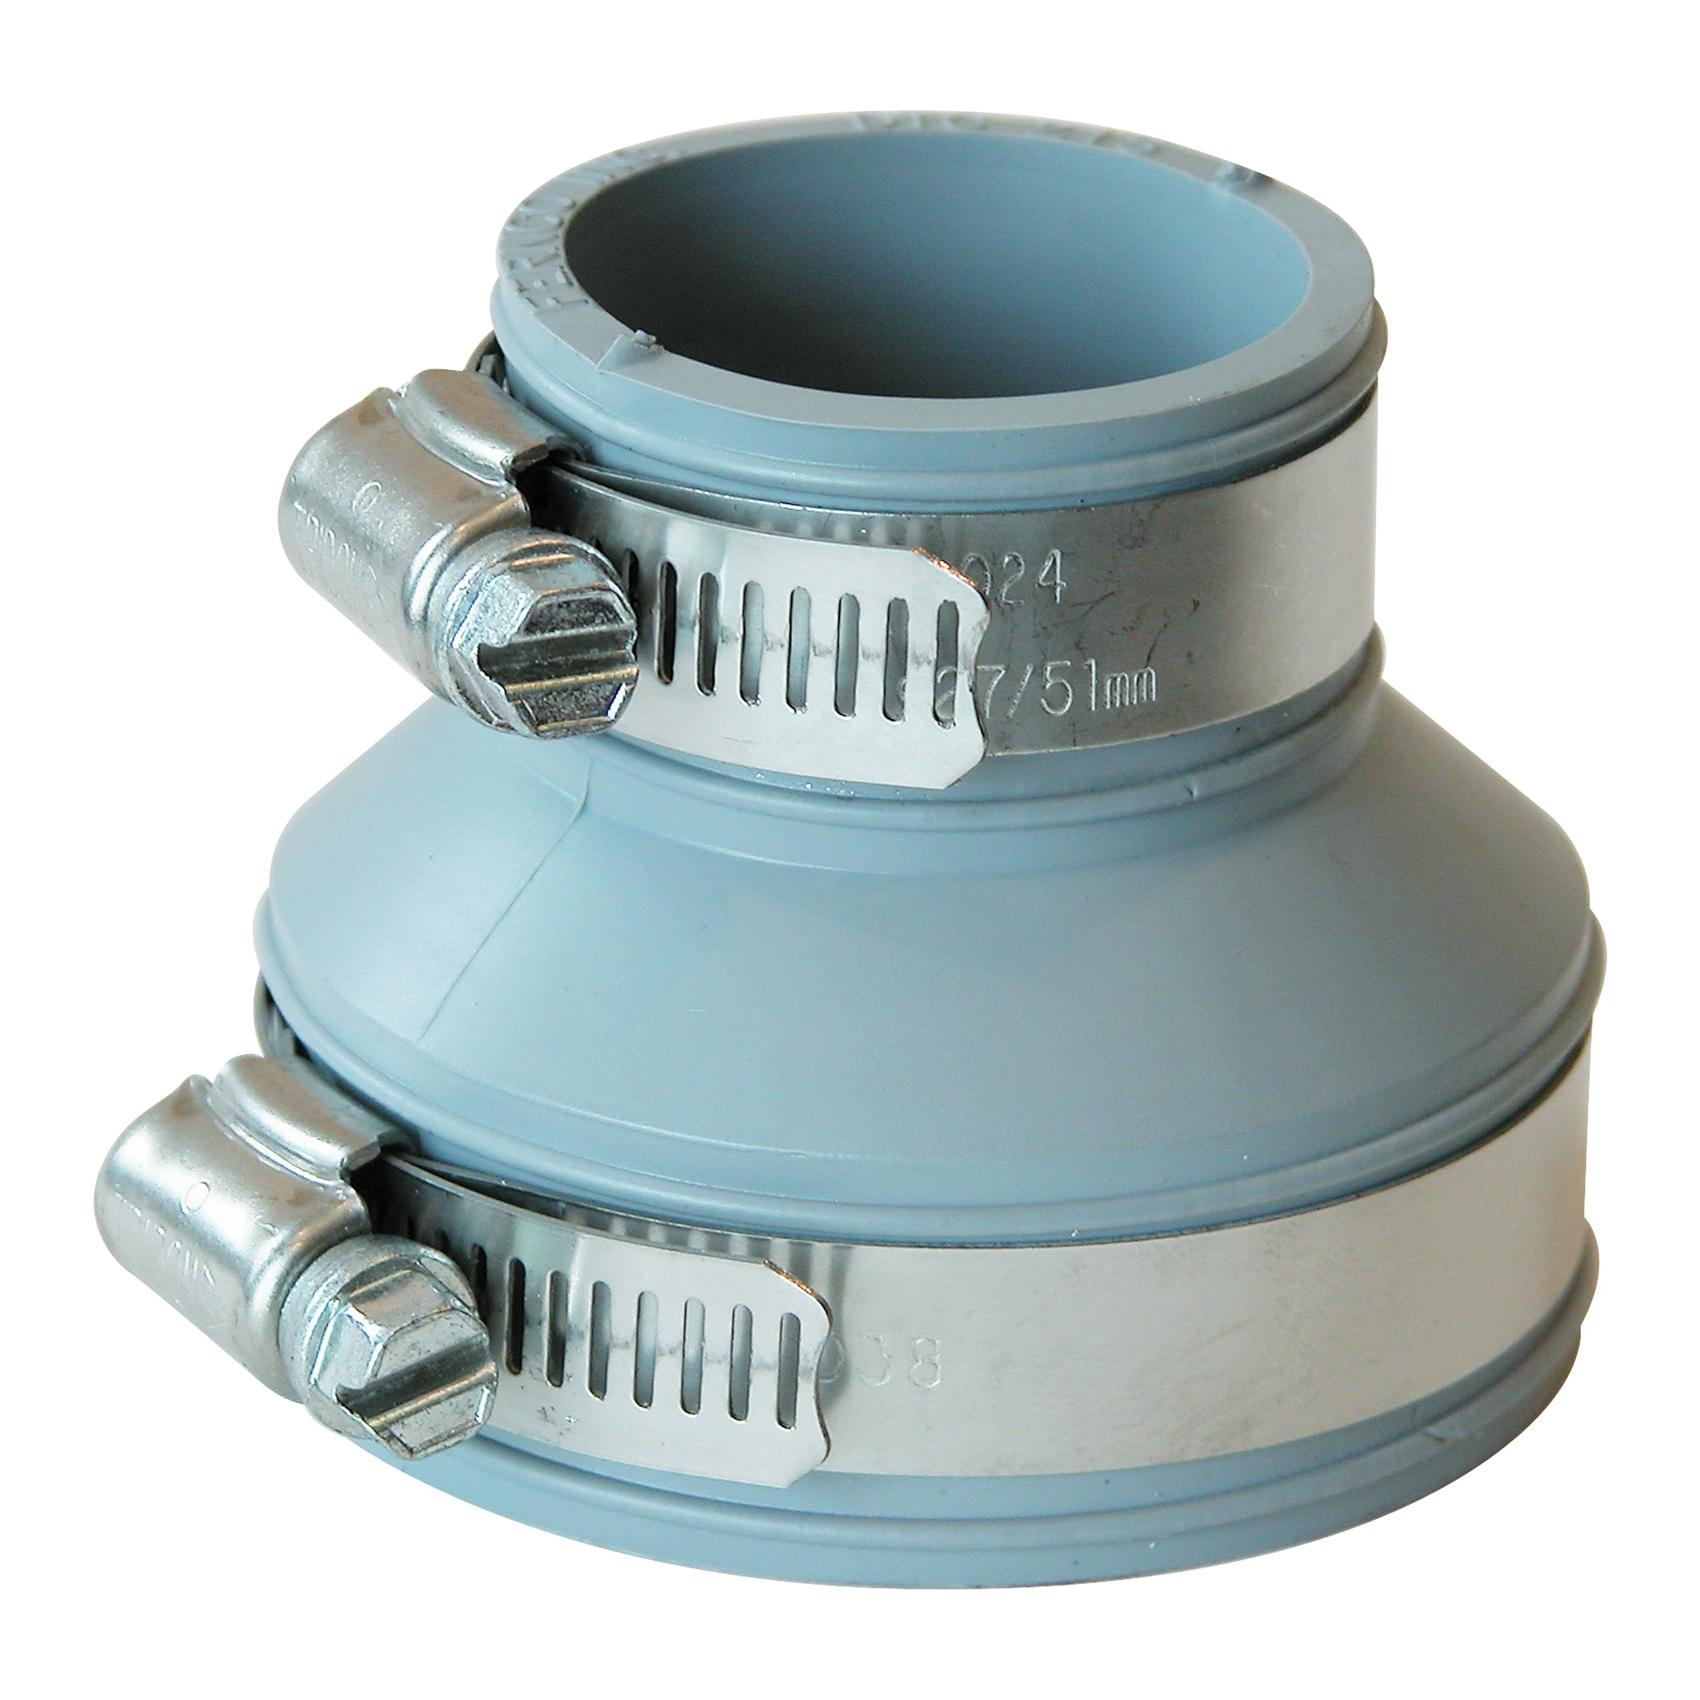 Picture of FERNCO PDTC-215 Drain Trap Connector, 1-1/4 x 2 in, PVC, 4.3 psi Pressure